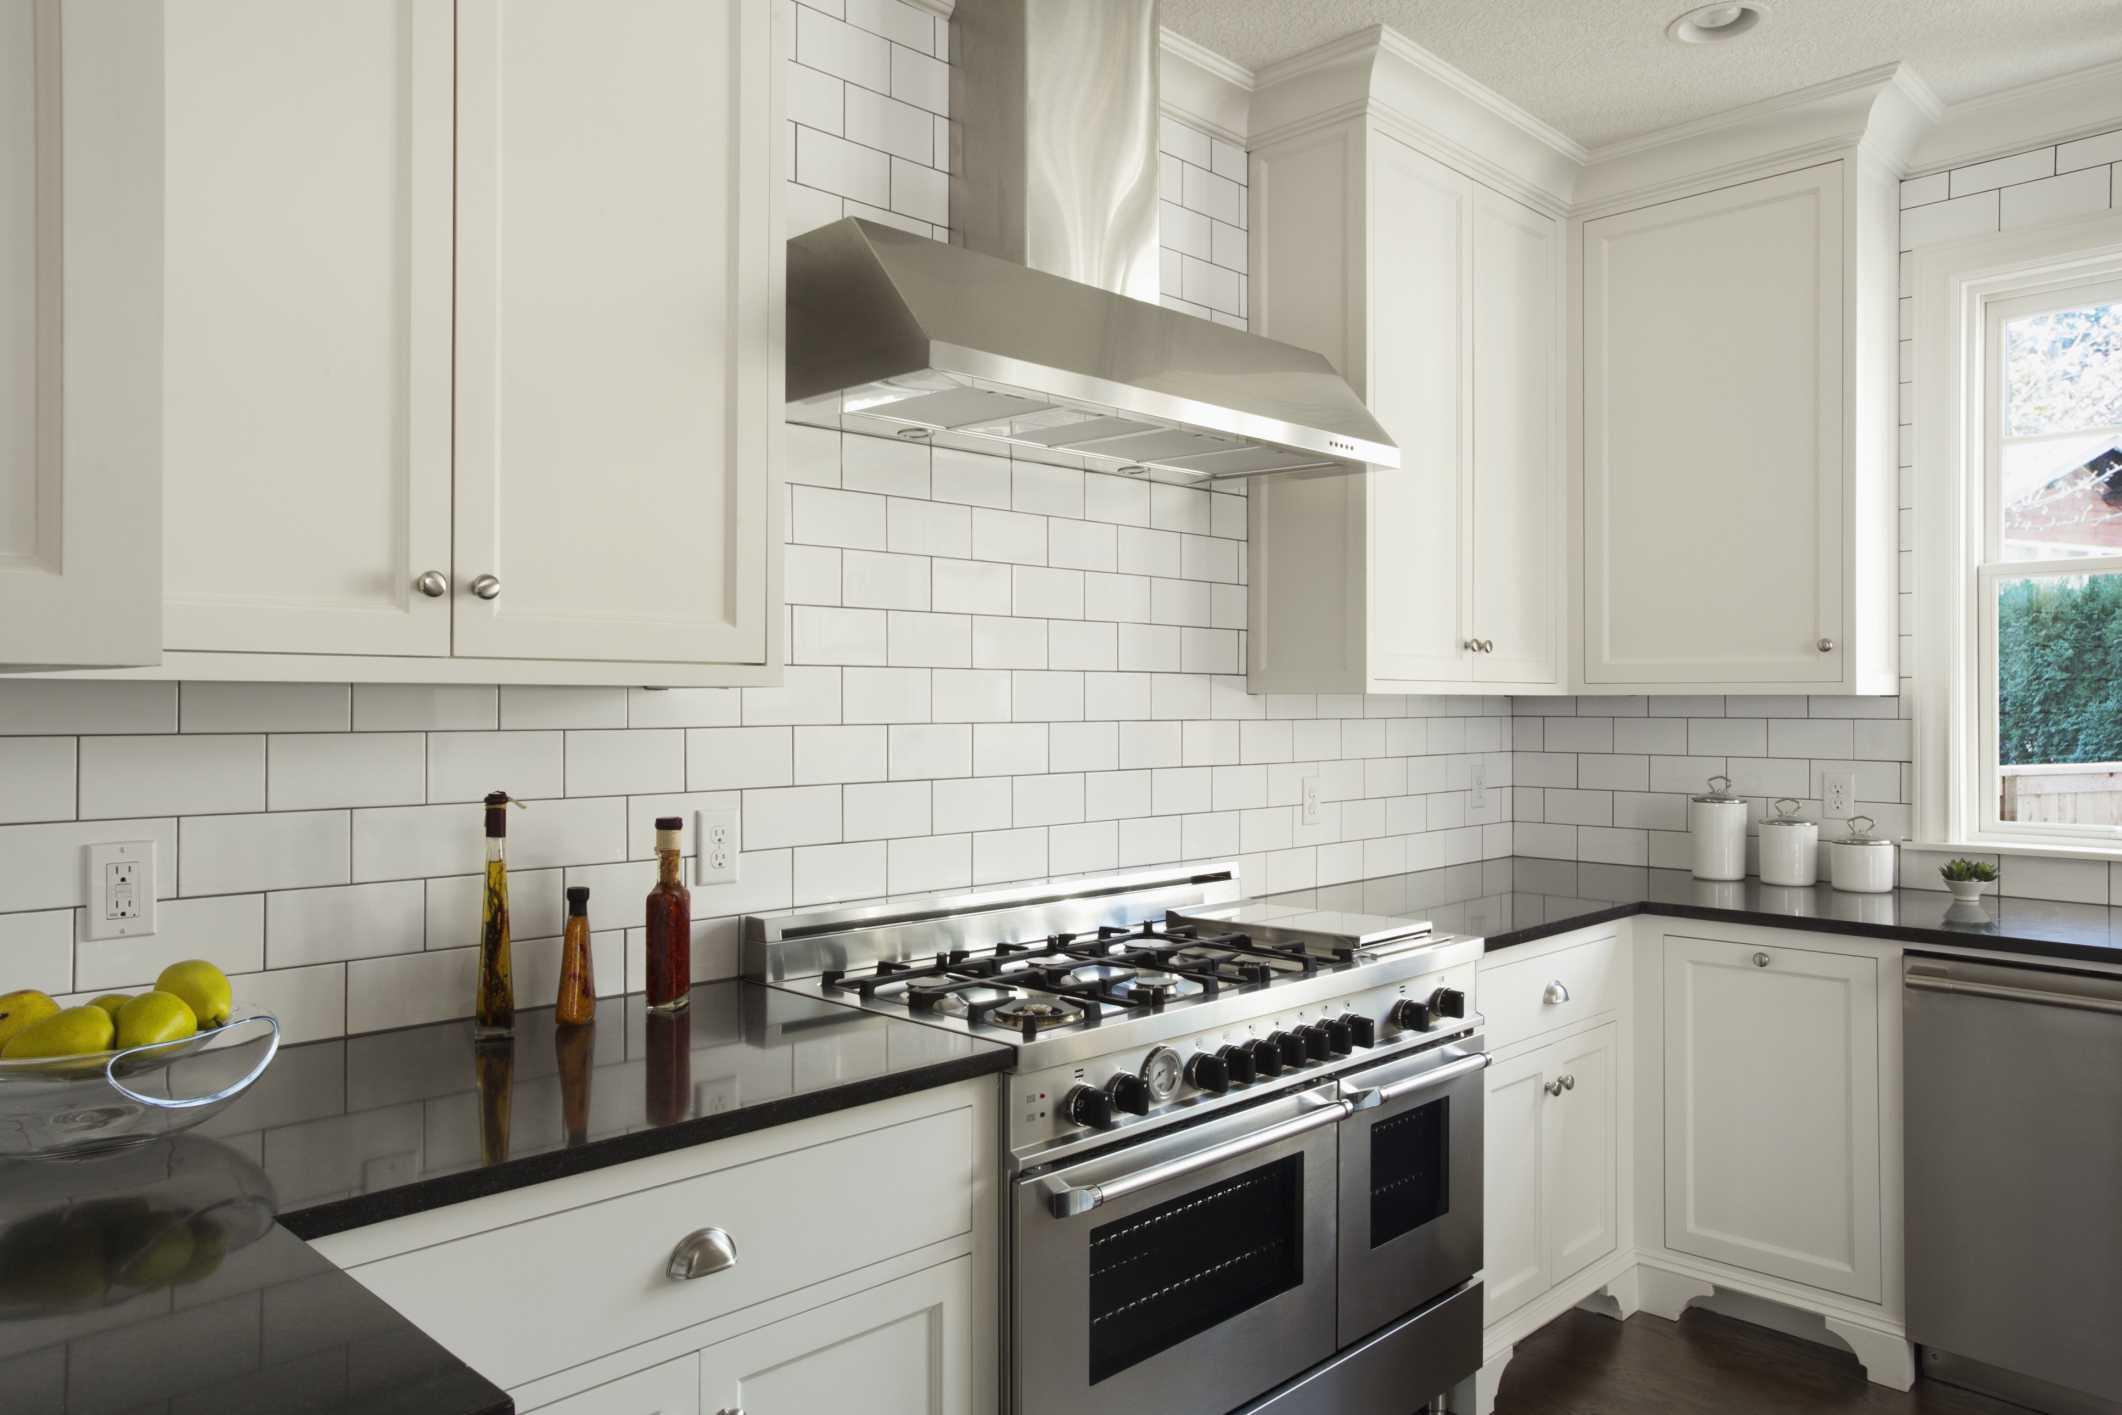 Modern Kitchen With White Subway Tile 56a49fe65f9b58b7d0d7e2d4